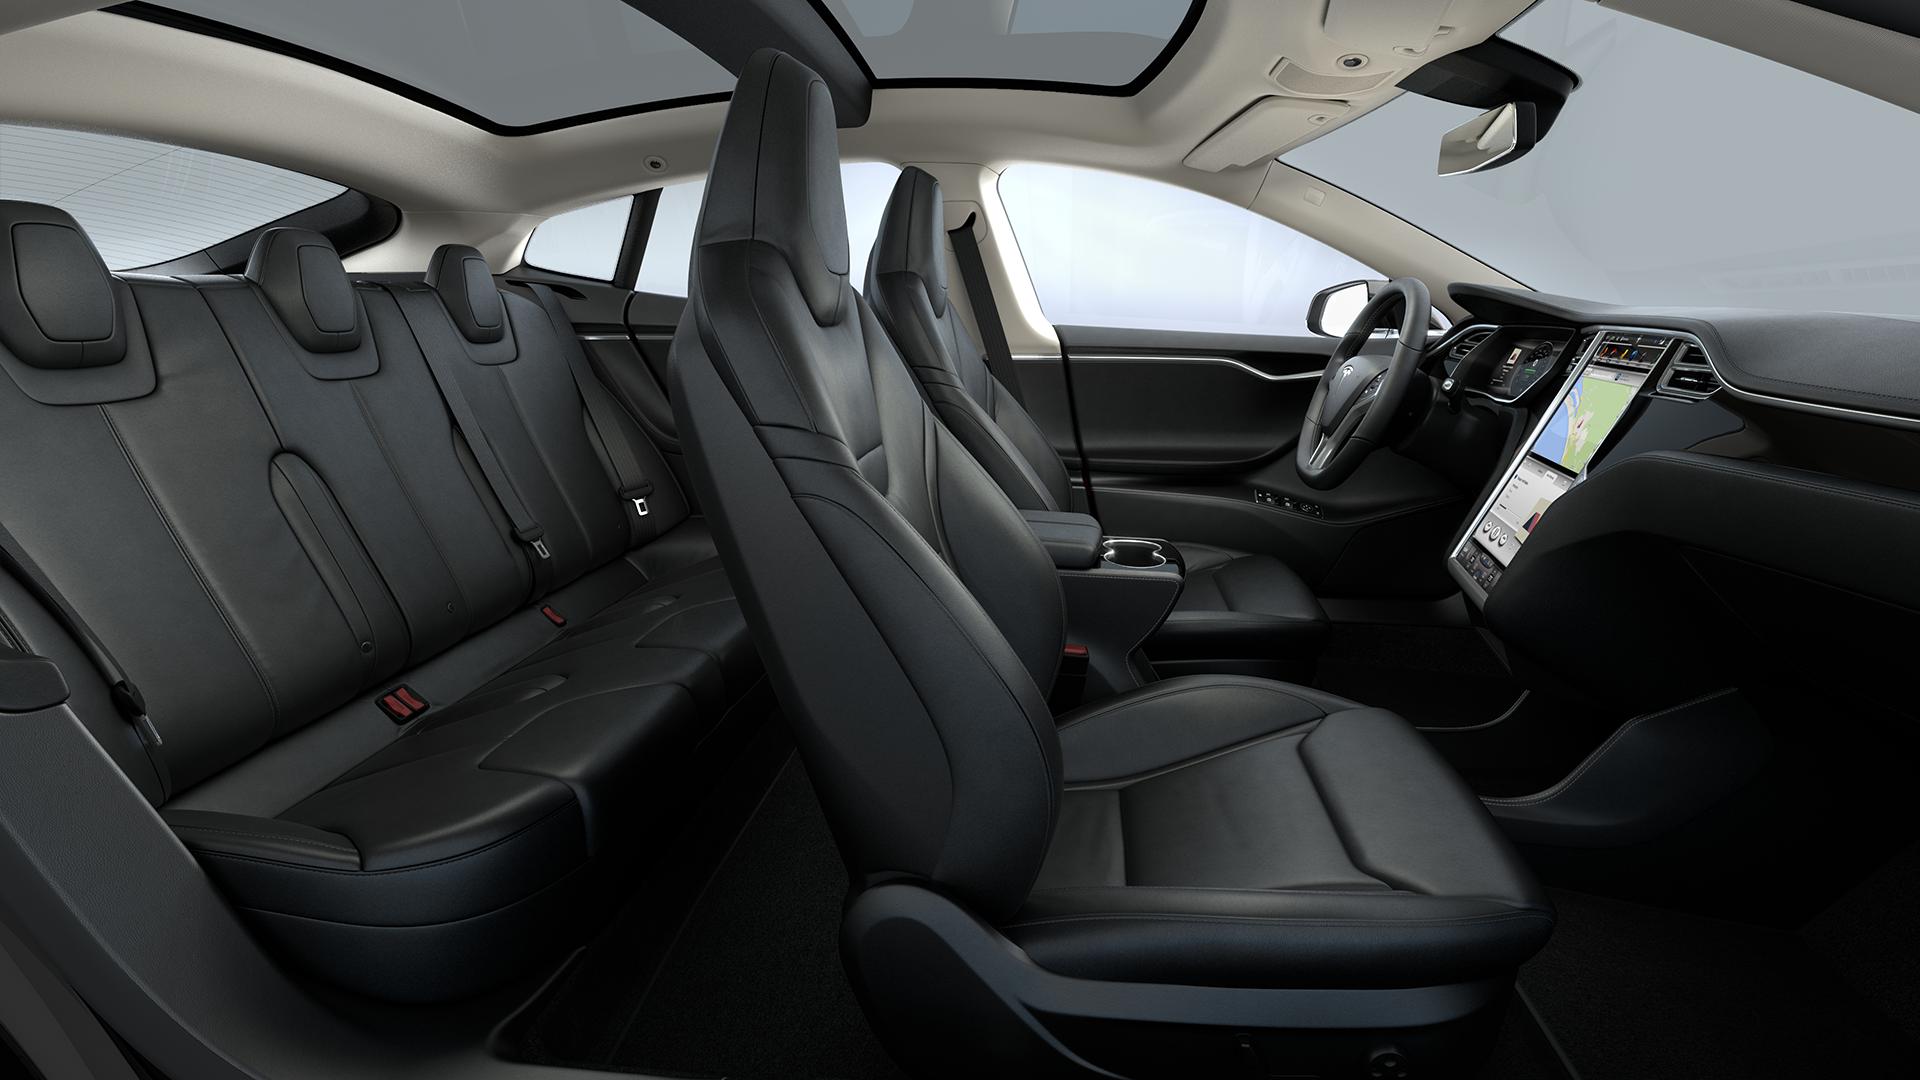 Interieur Black Premium Black Next Generation Seats Black Alcantara Headliner